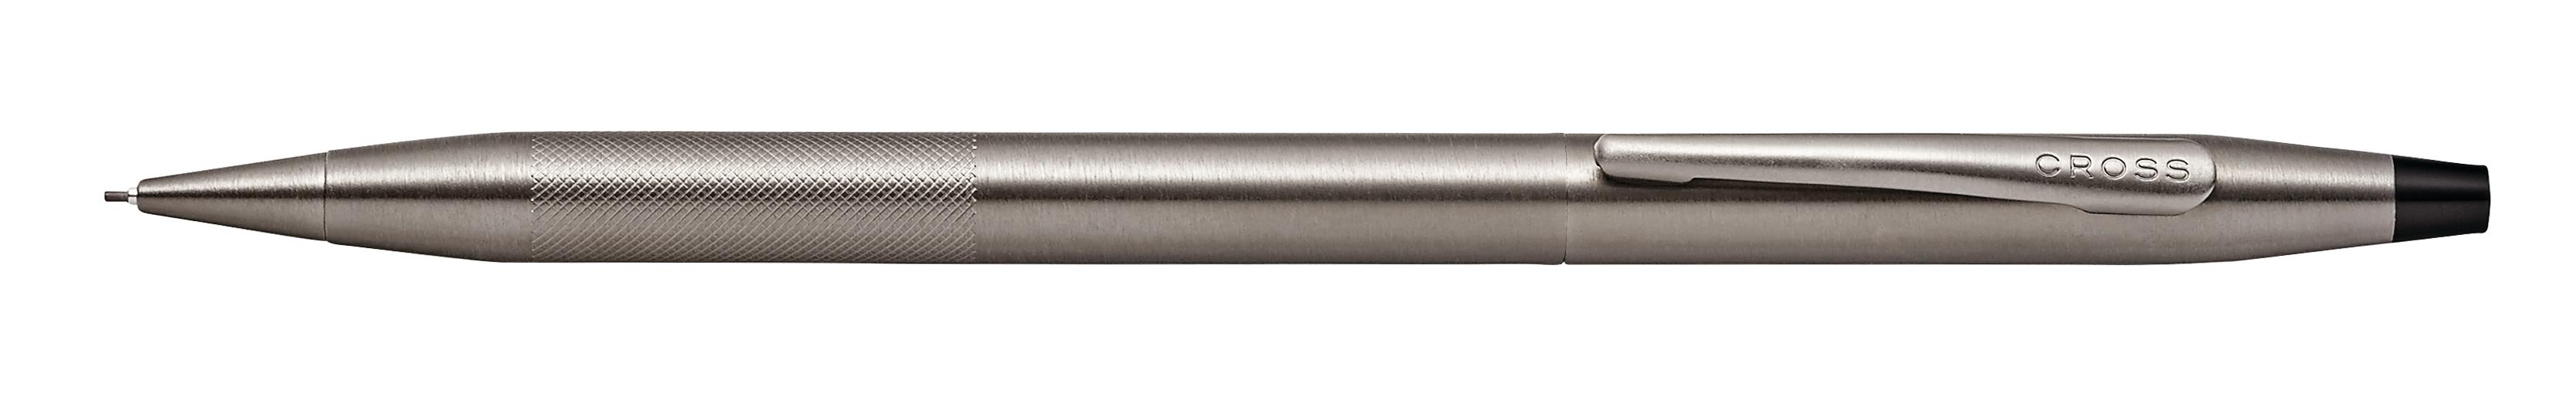 Classic Century Titanium Gray PVD 0.7MM Pencil with Micro-knurl Detail